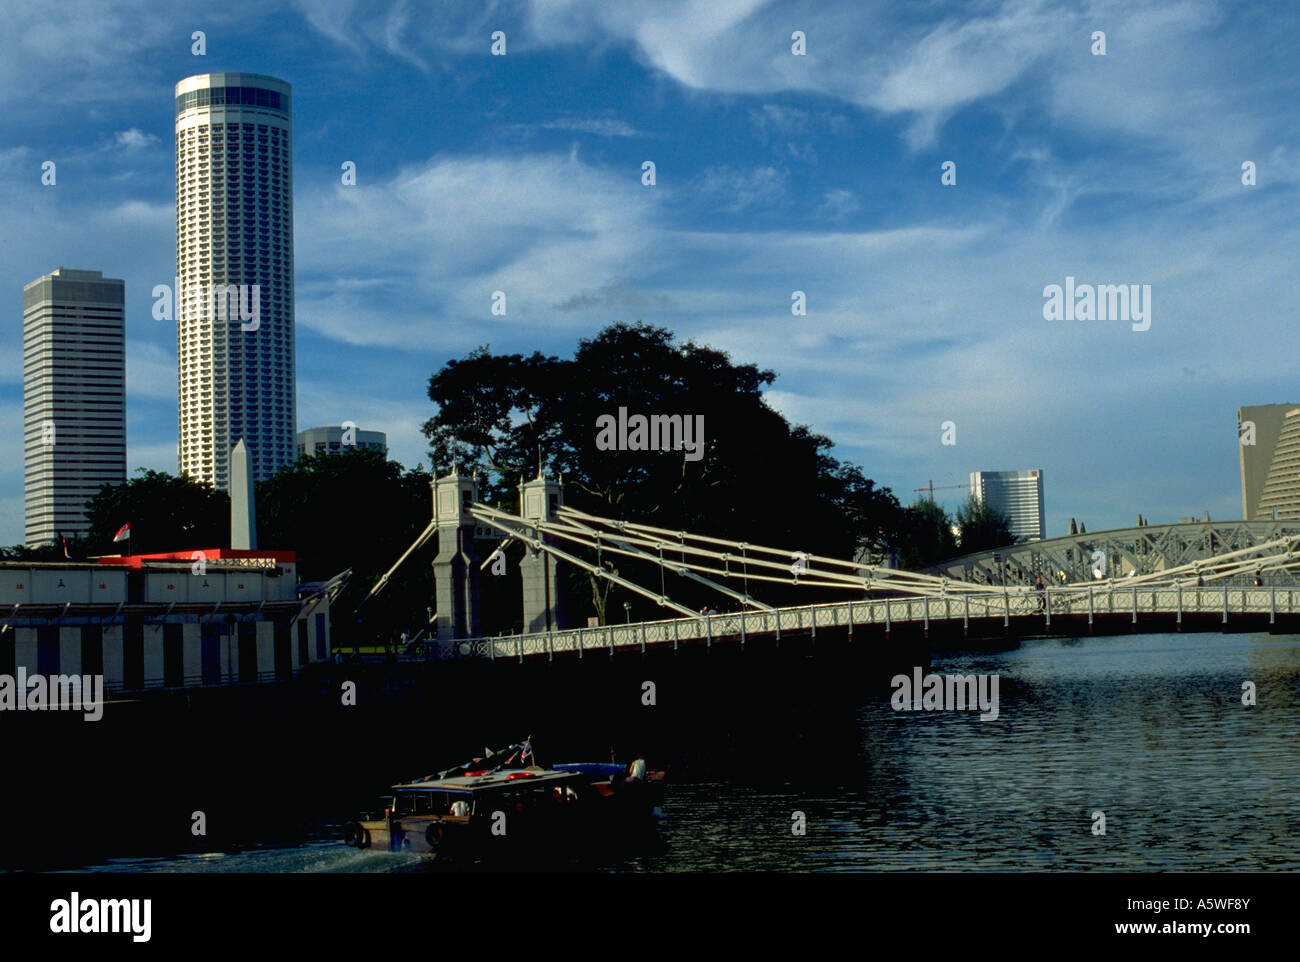 Painet hk2930 singapore river canal bridge buildings boat cityscape cities transportation southeast asia account - Stock Image